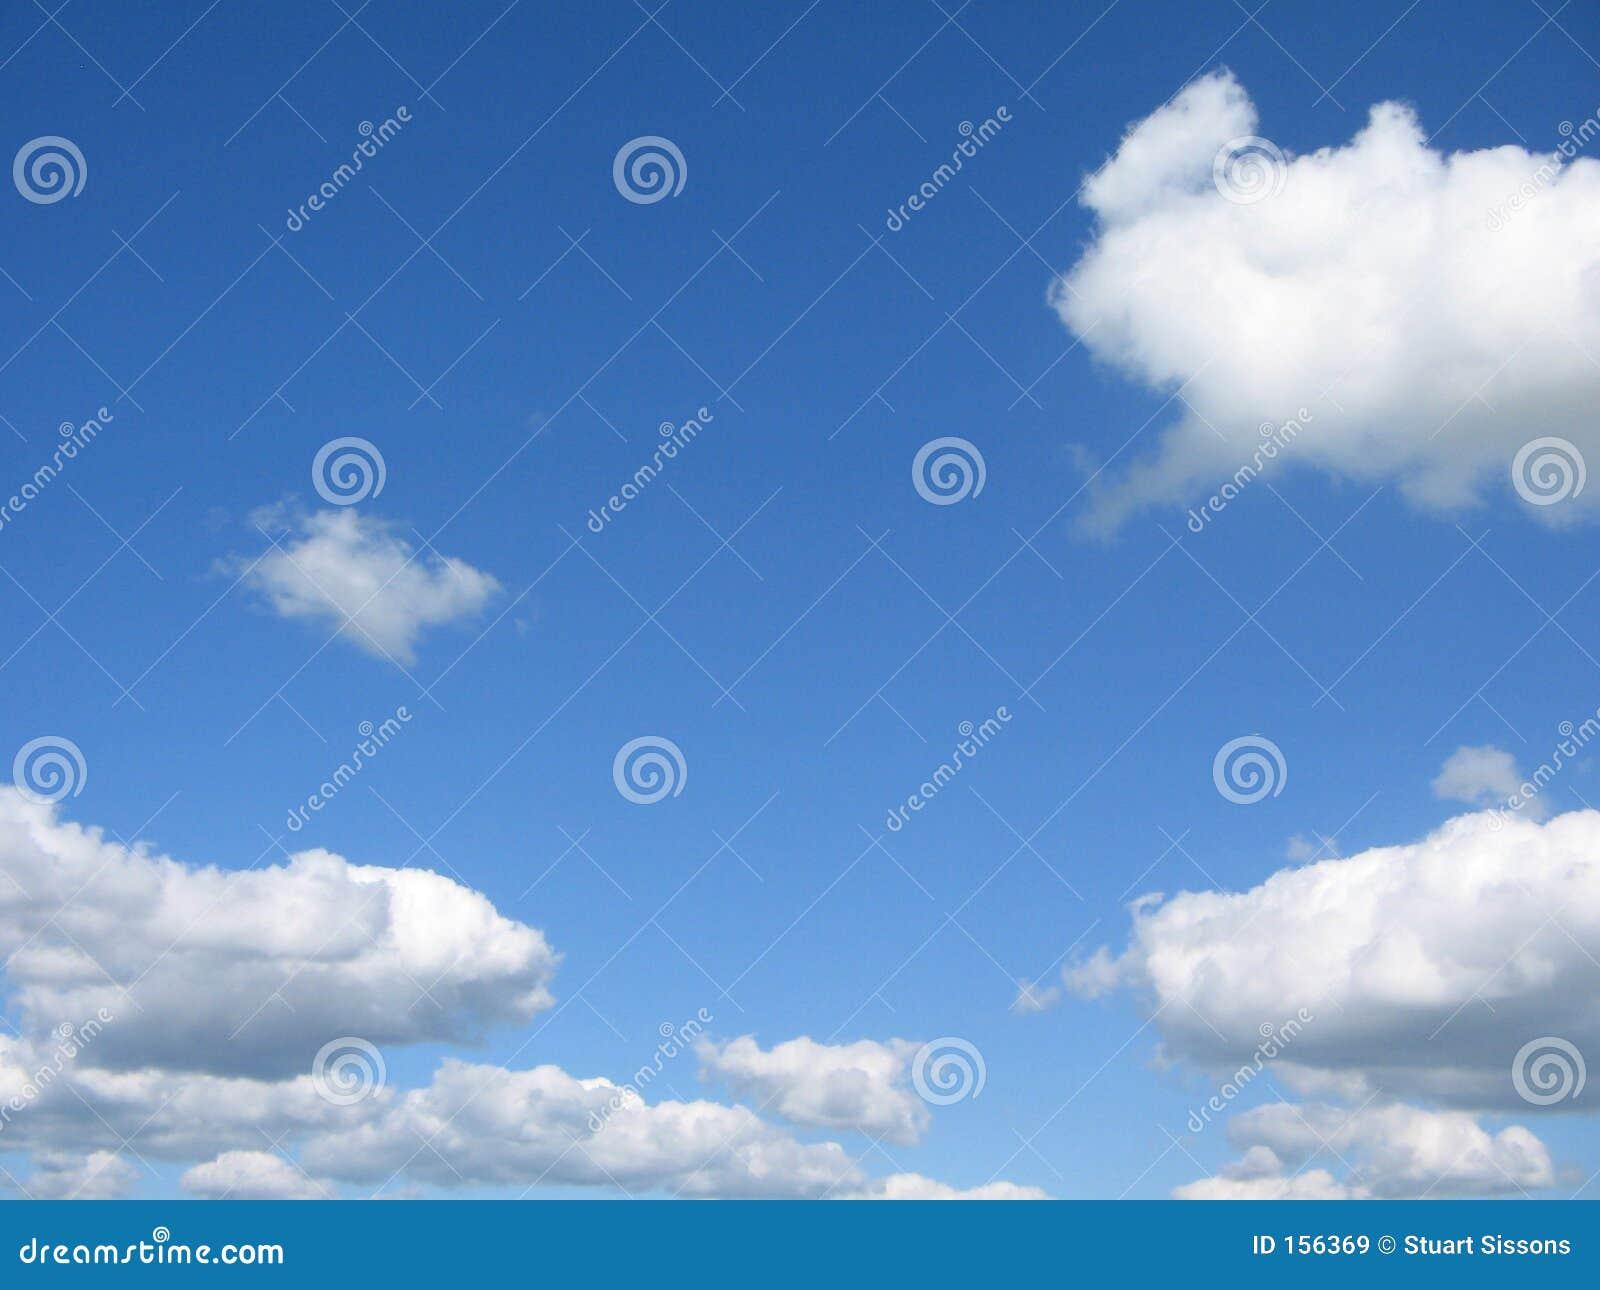 White summer clouds